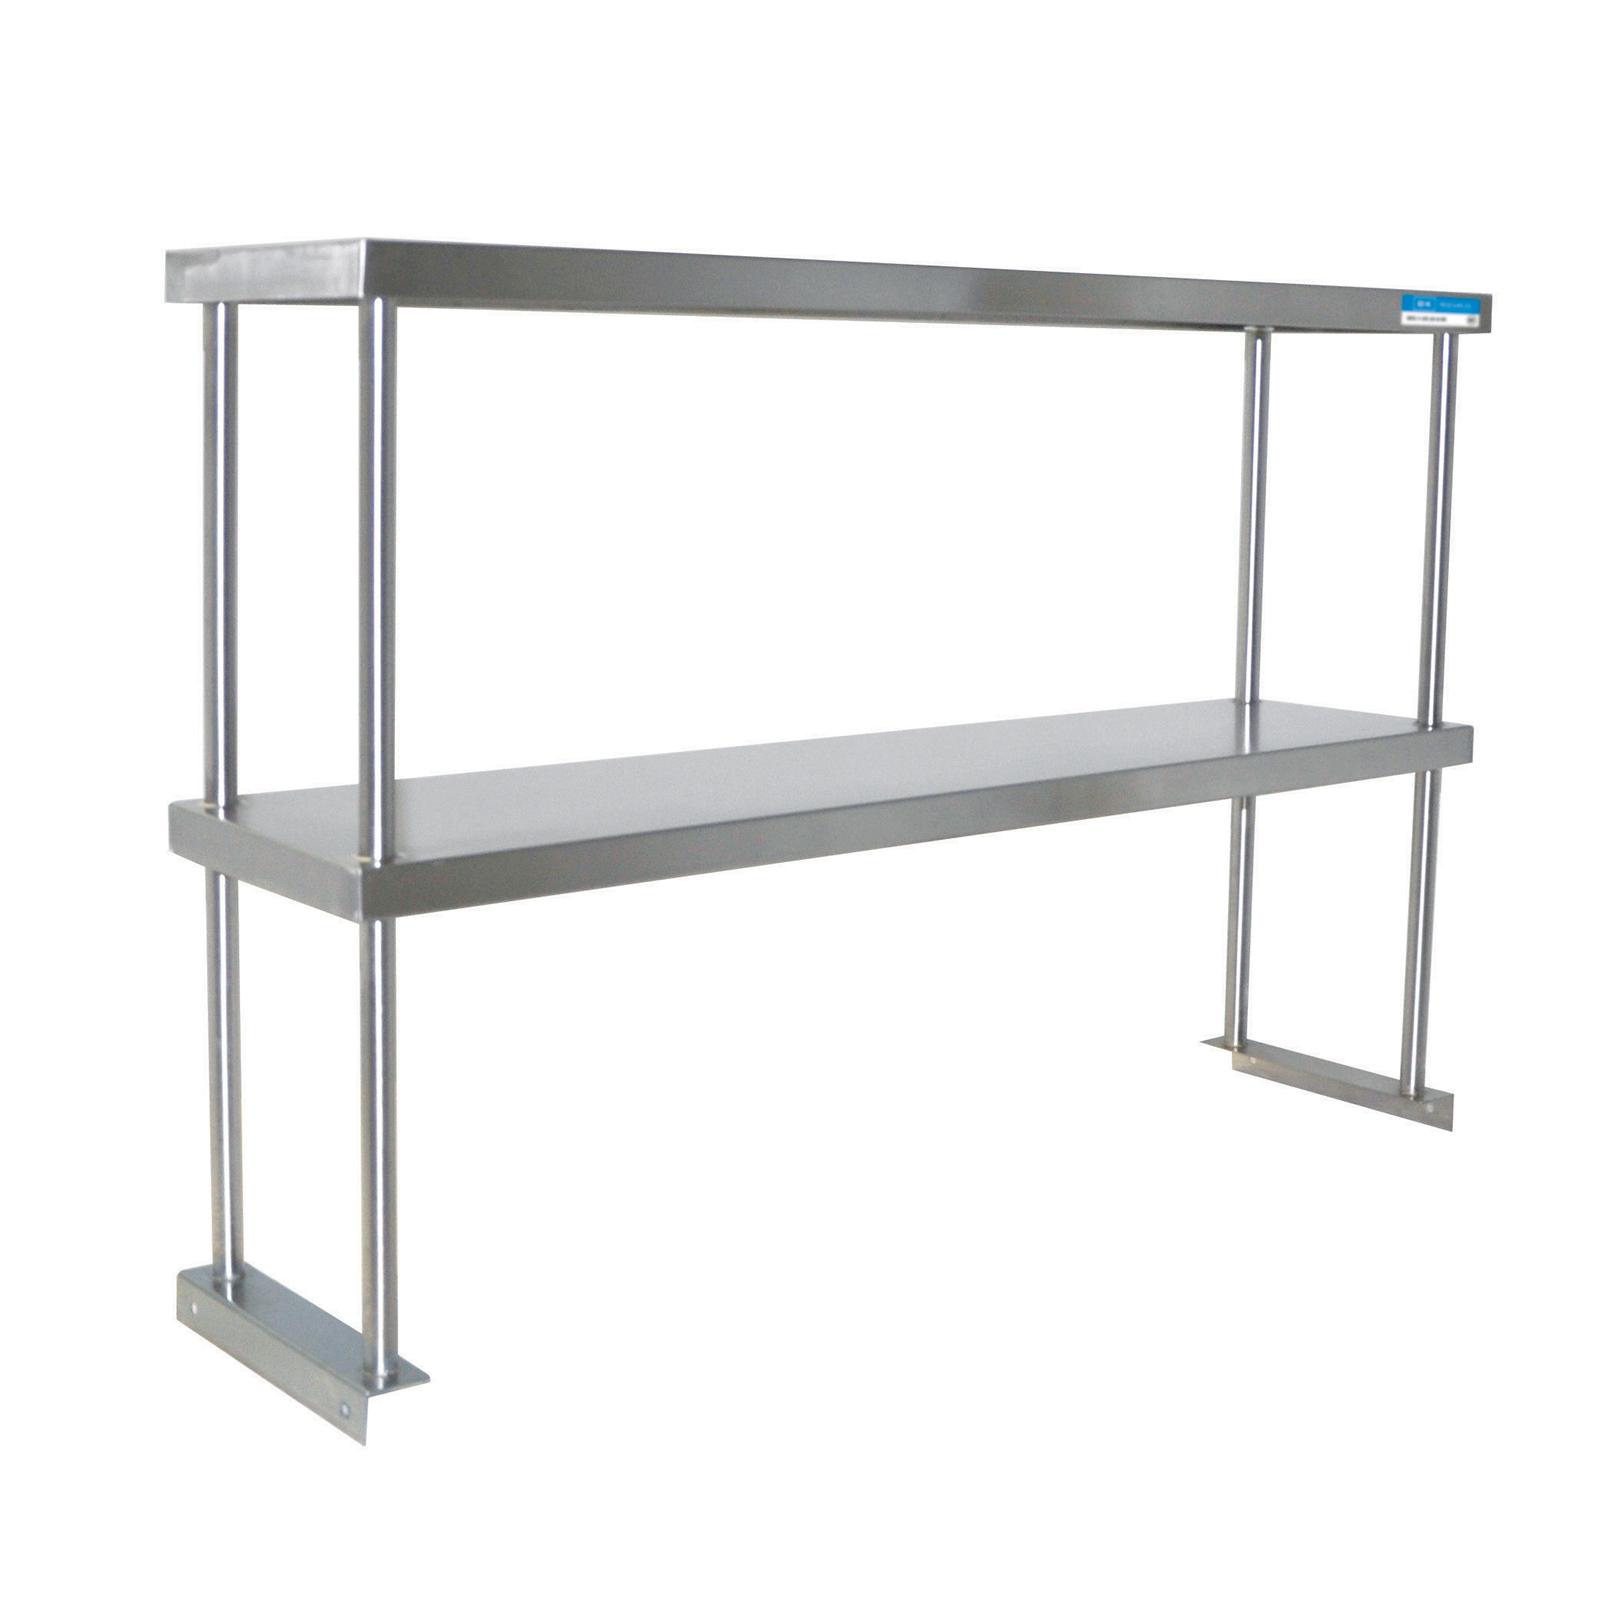 BK Resources BK-OSD-1896 overshelf, table-mounted